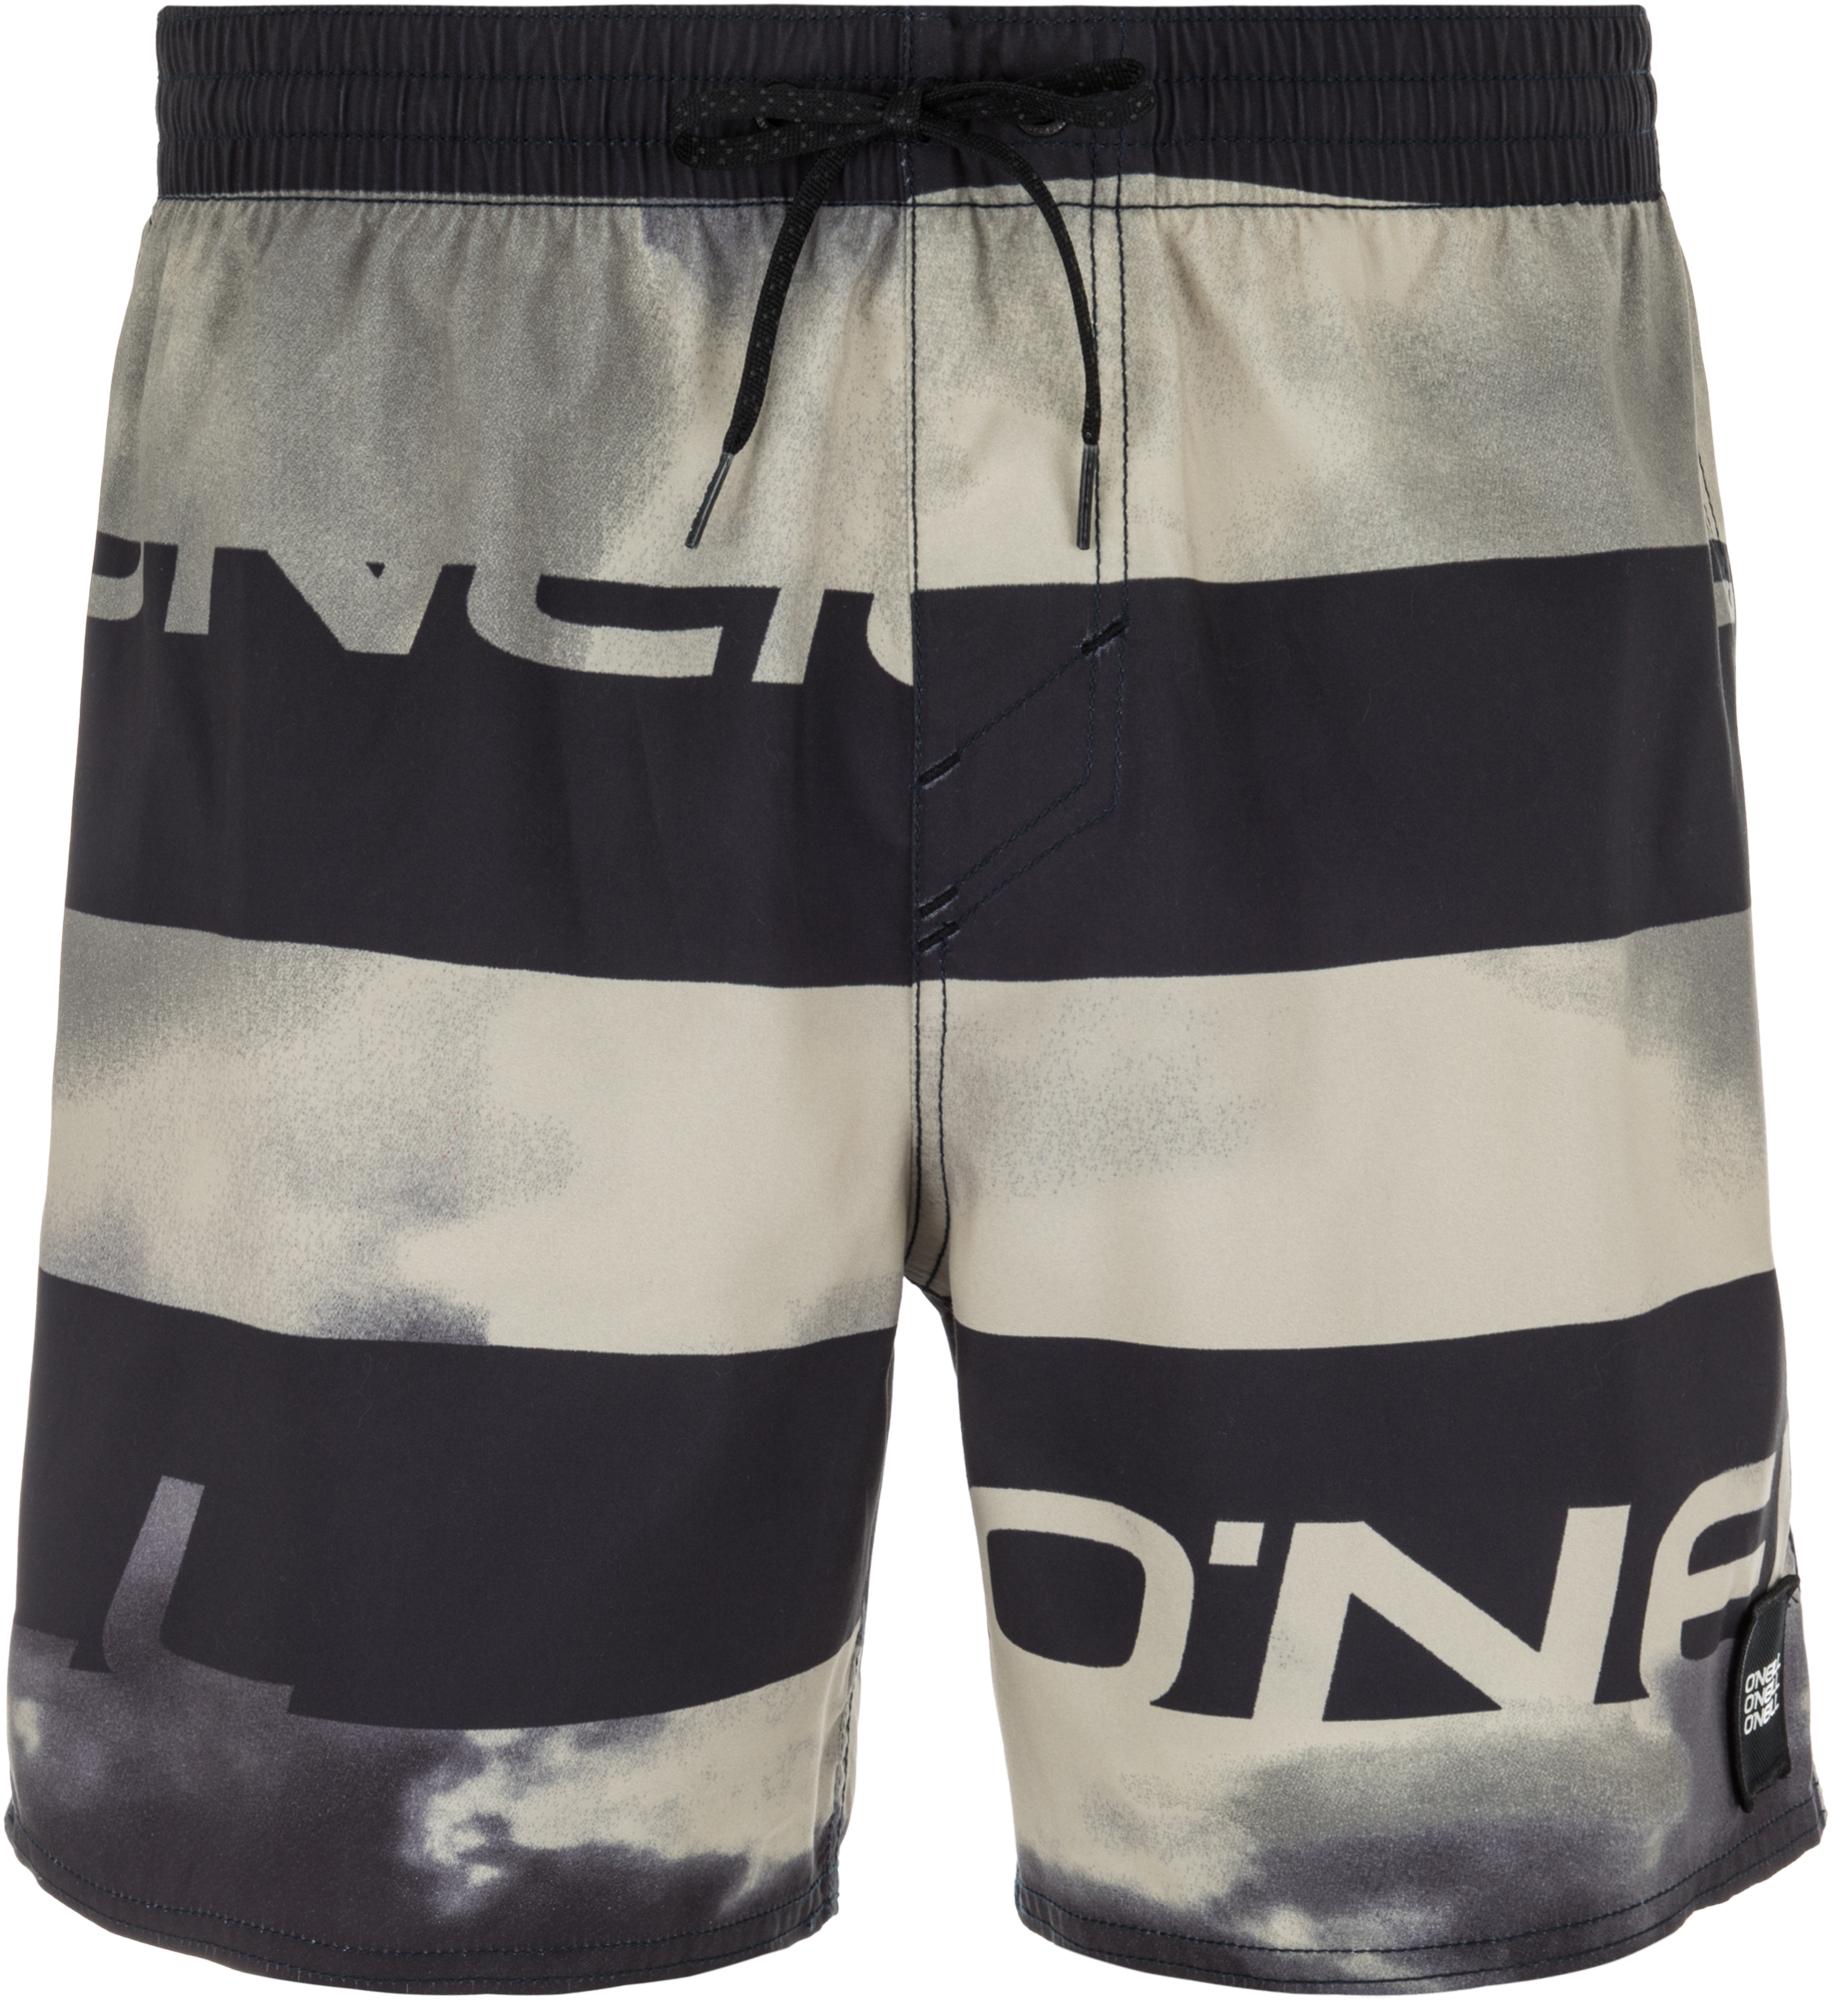 O'Neill Шорты пляжные мужские O'Neill Hm Sunstroke, размер 46-48 molo шорты пляжные nario рассвет